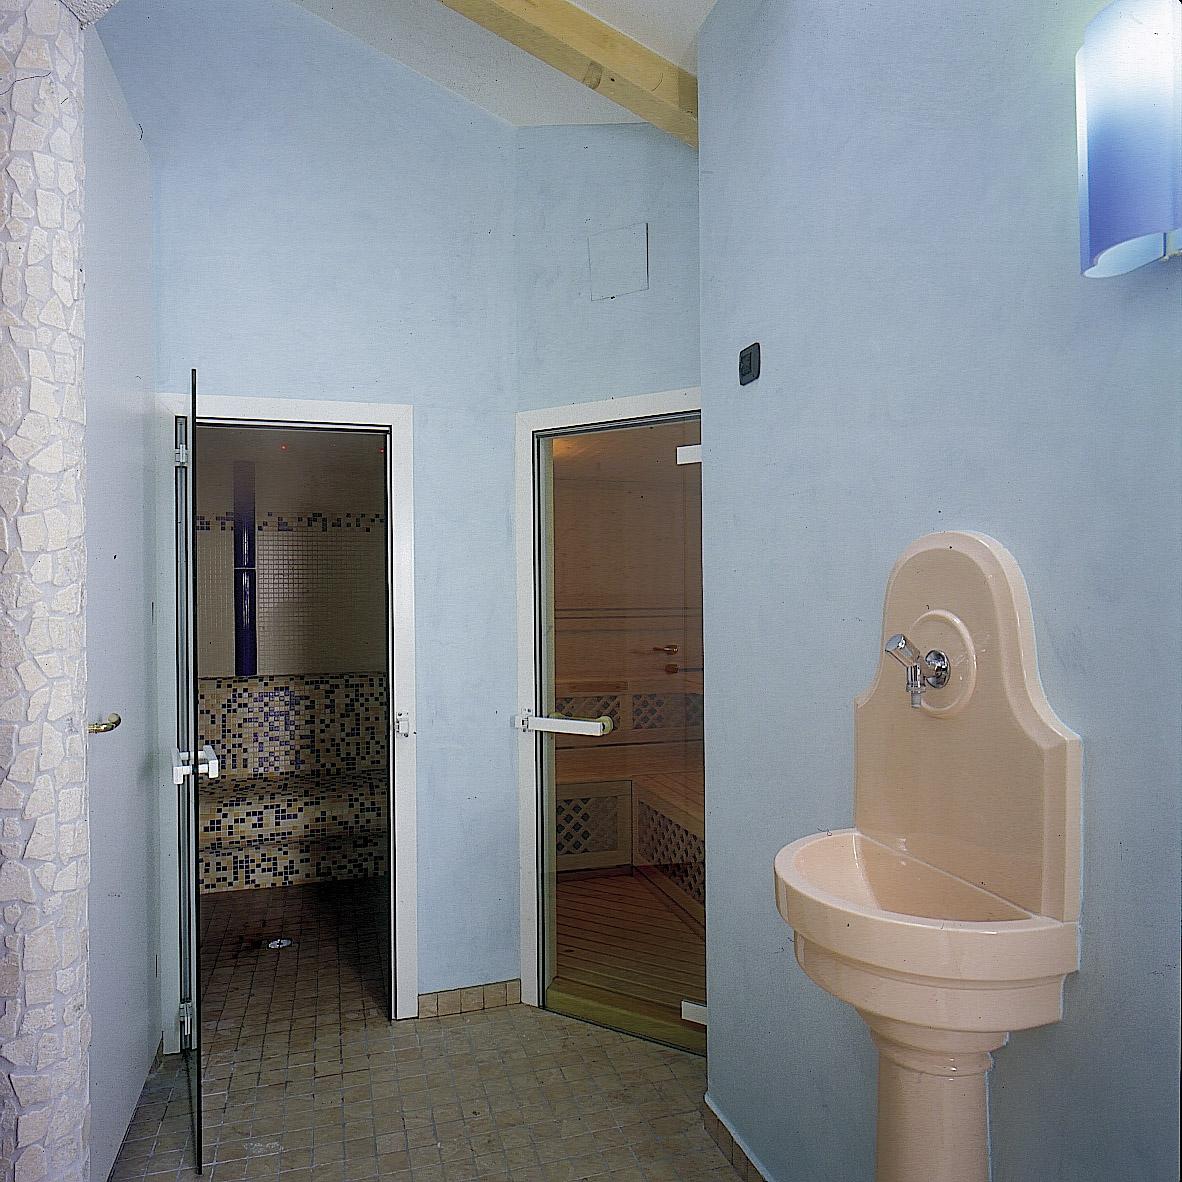 Ristorante Hotel Olivo Arco: HOTEL - WELLNESS